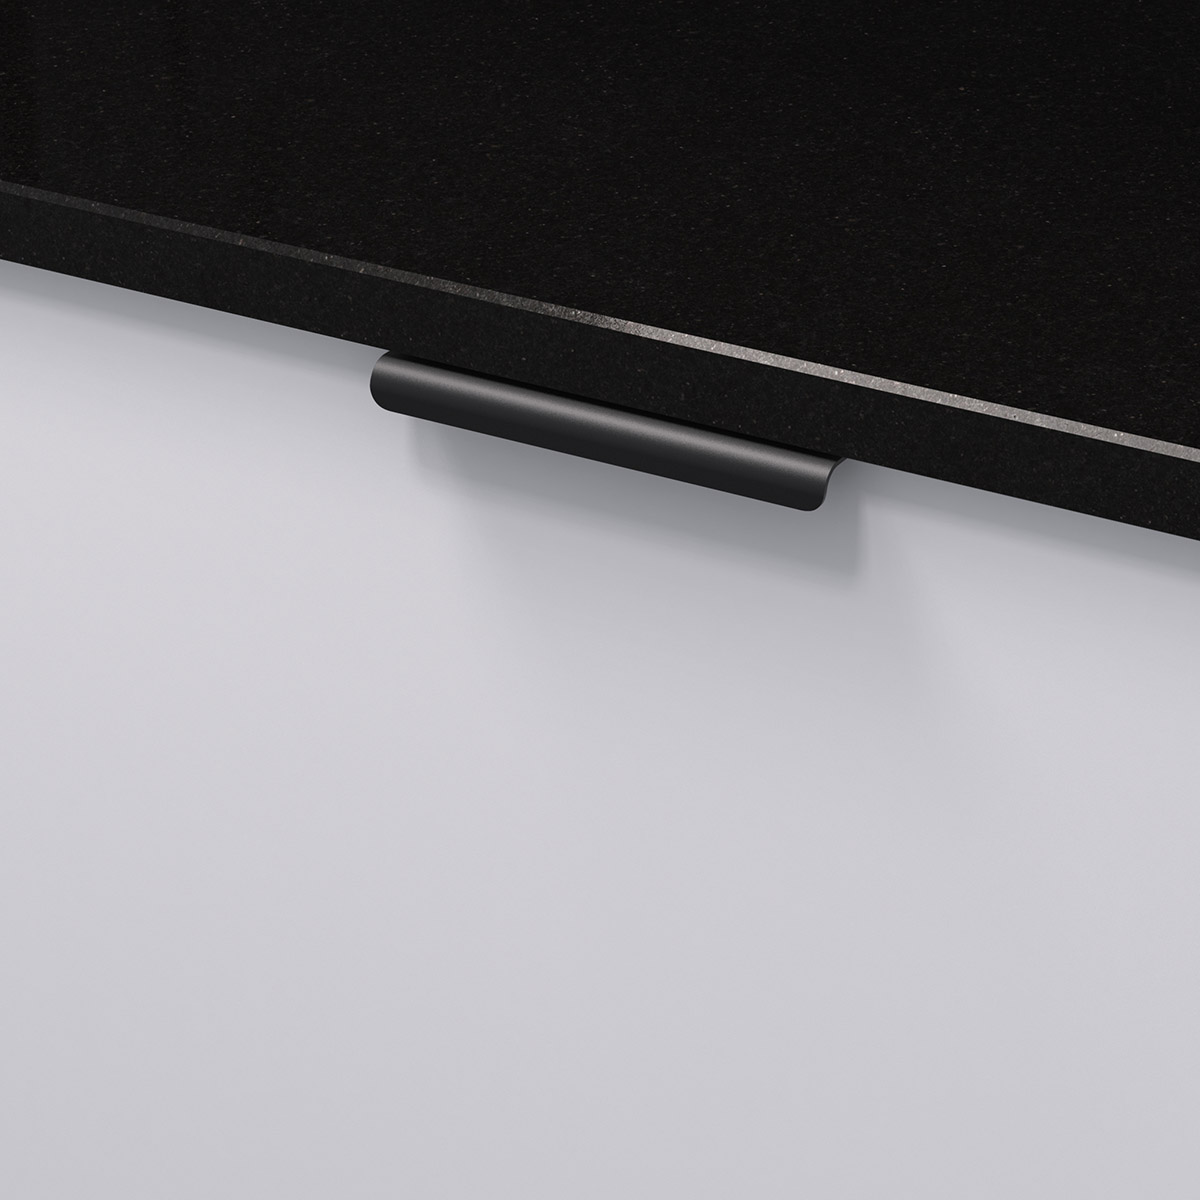 Profilhandtag lip svart 343458 11 120 mm ncs s 0300 n granit svart